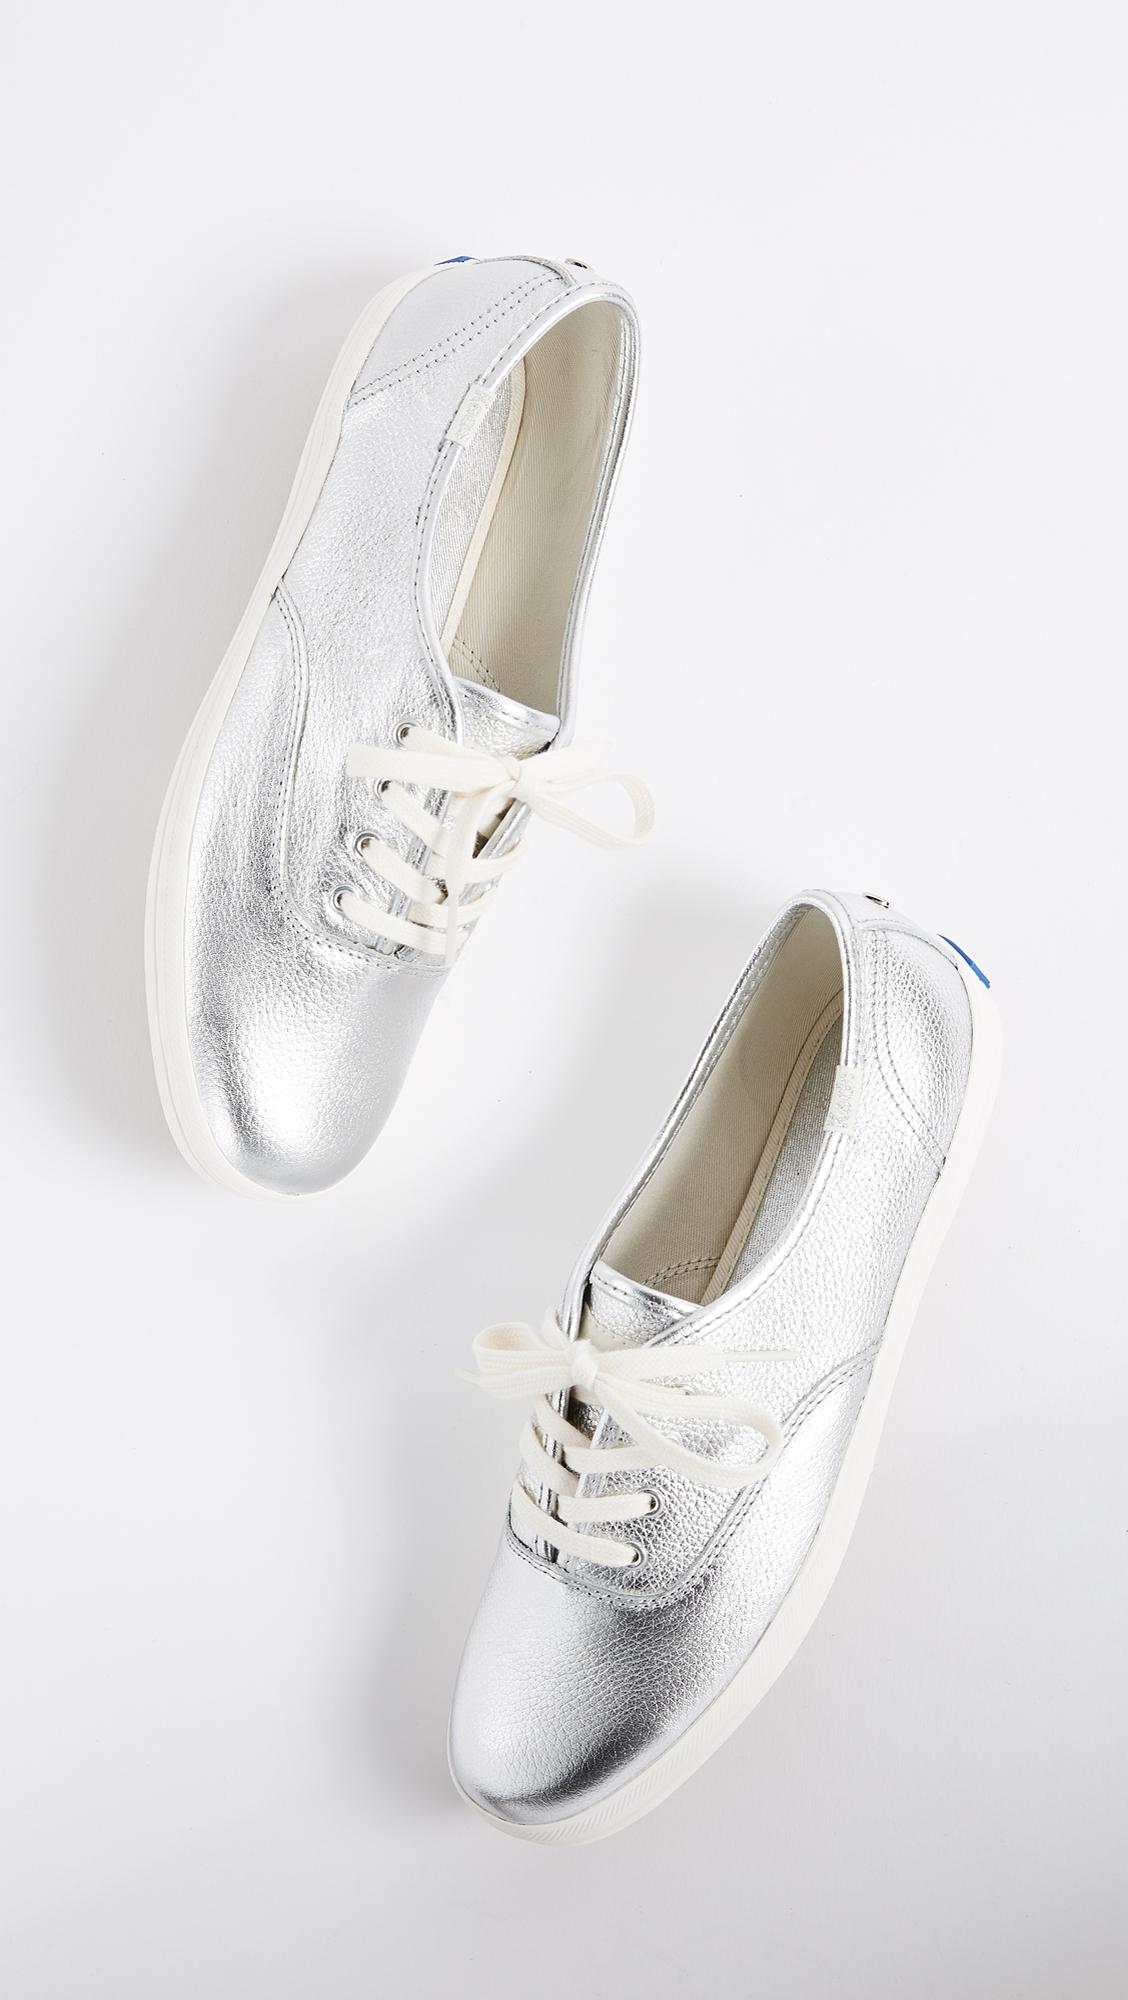 bb1c870874b4 Keds x Kate Spade New York Sneakers